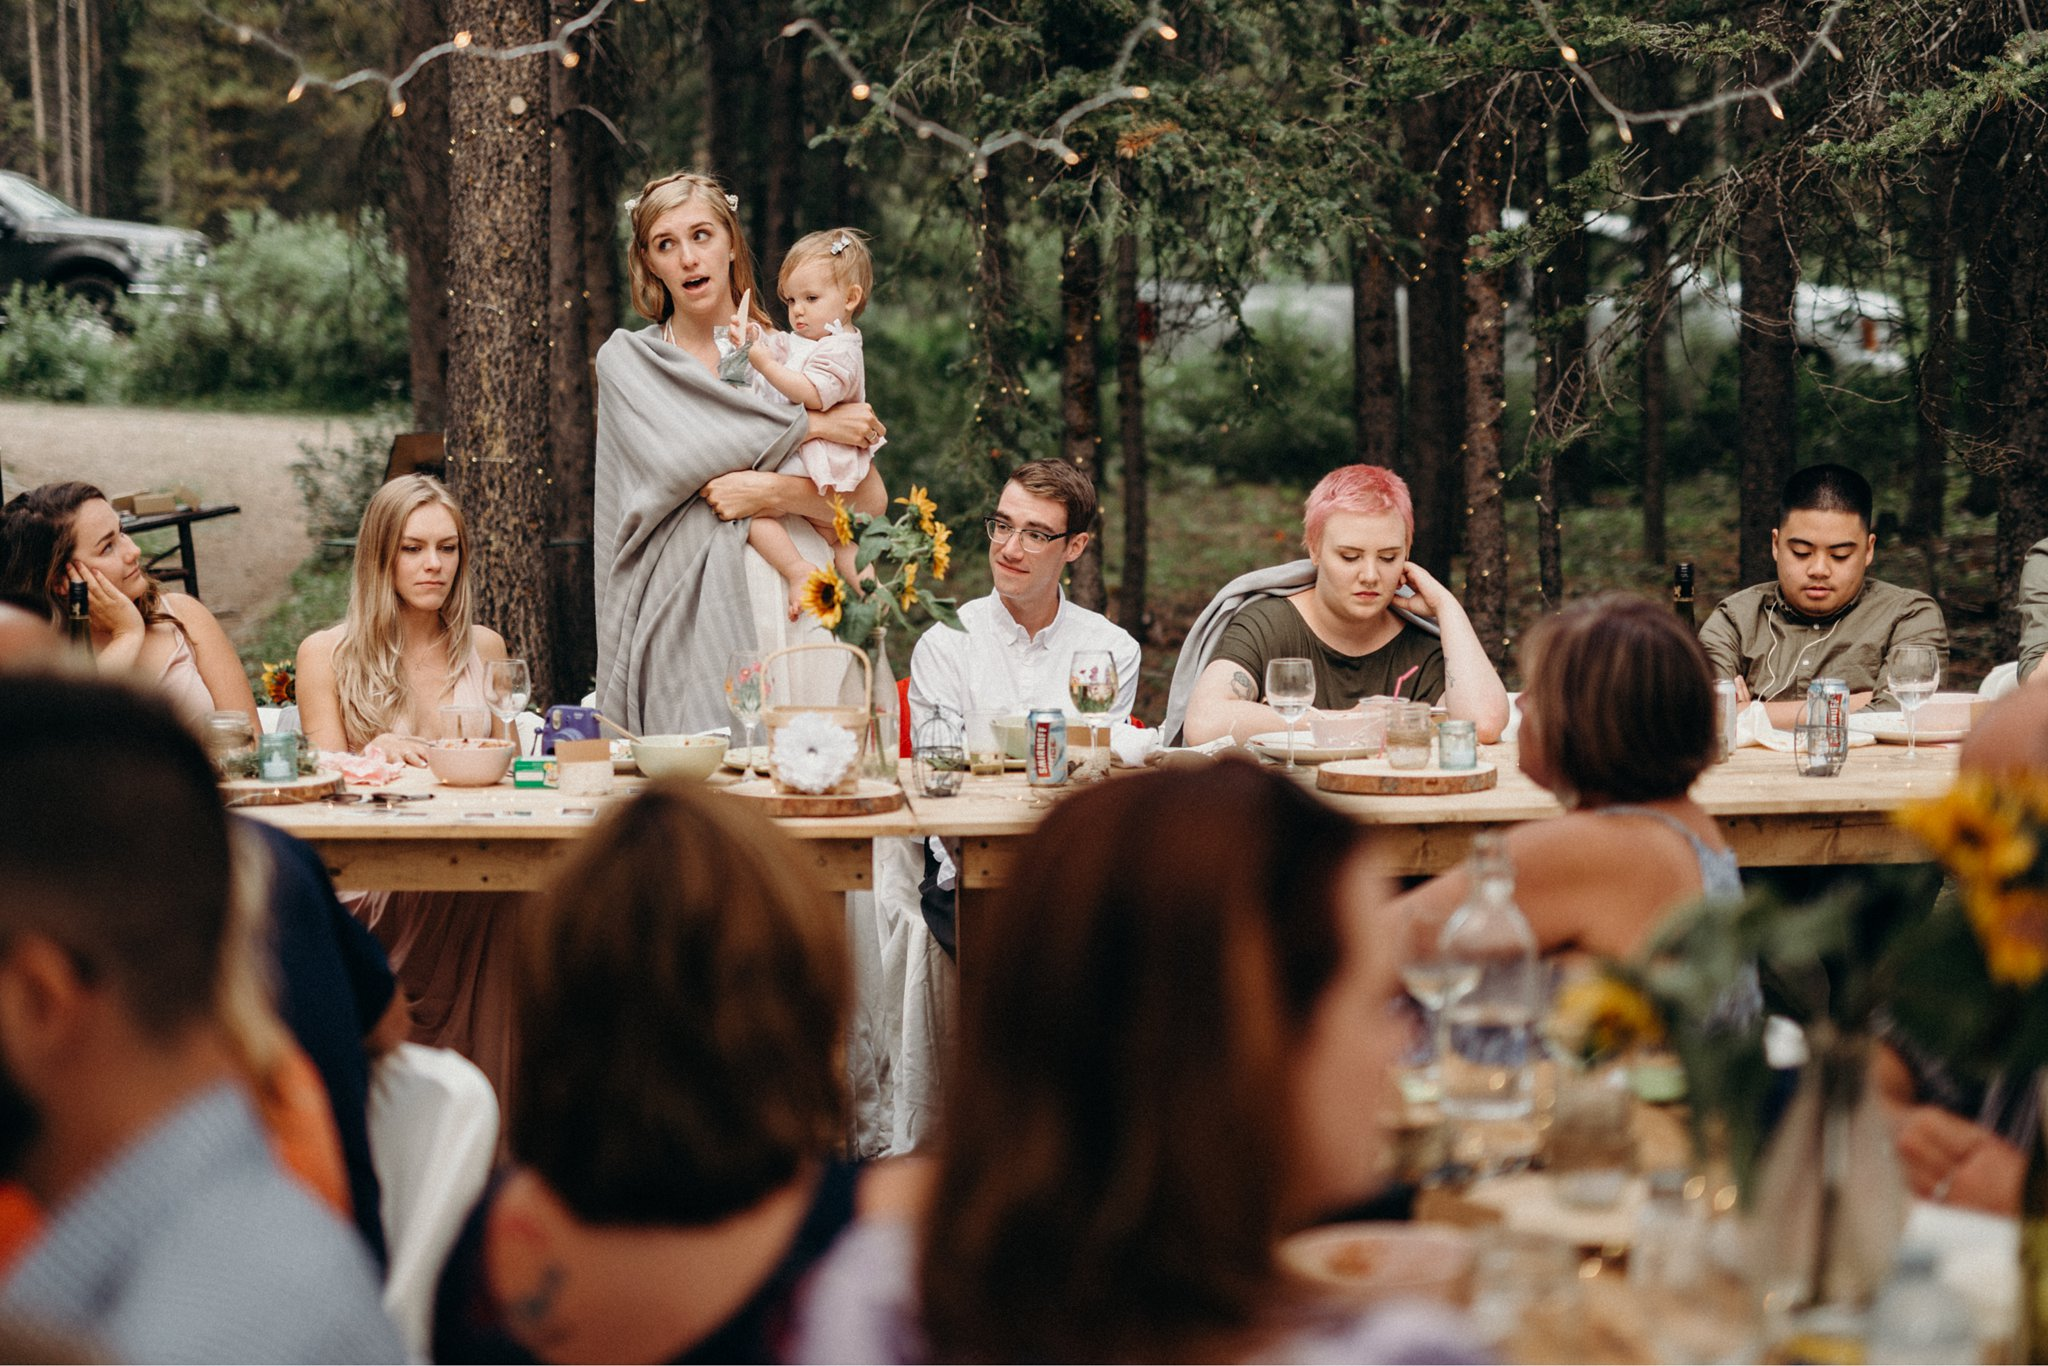 kaihla_tonai_intimate_wedding_elopement_photographer_6427.jpg